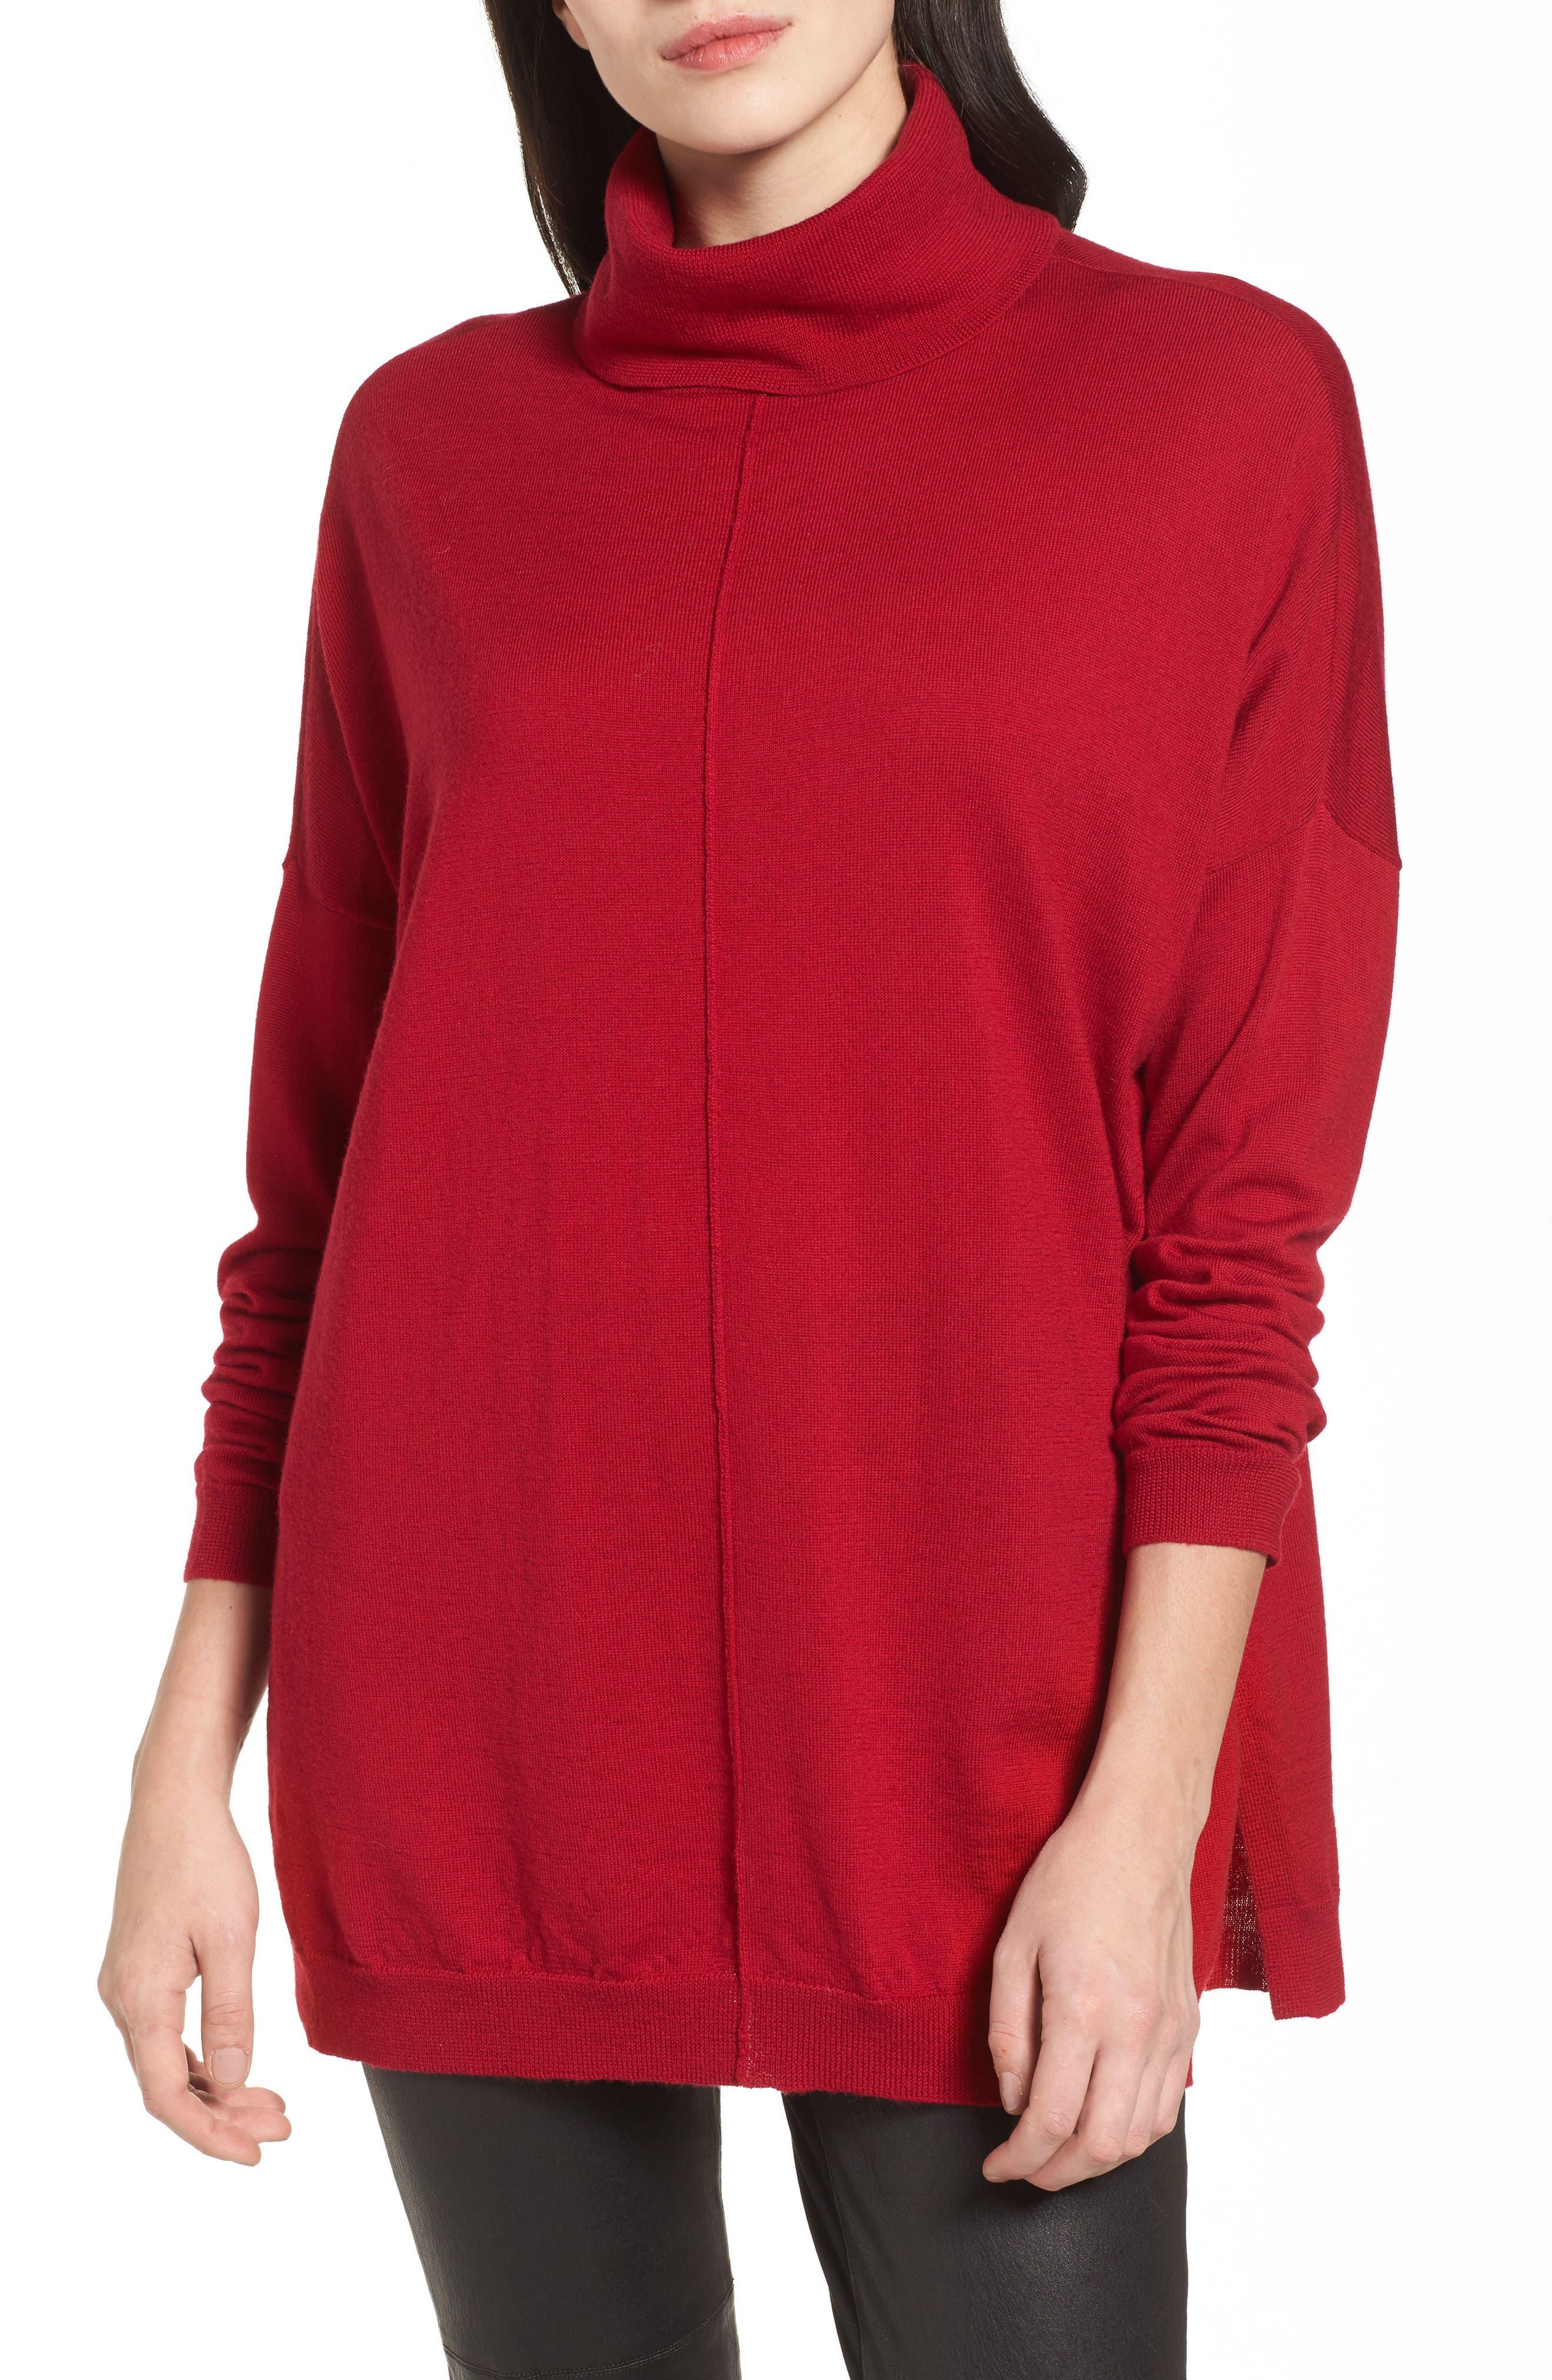 Alternate Image 1 Selected - Eileen Fisher Merino Wool Boxy Turtleneck Sweater (Regular & Petite)